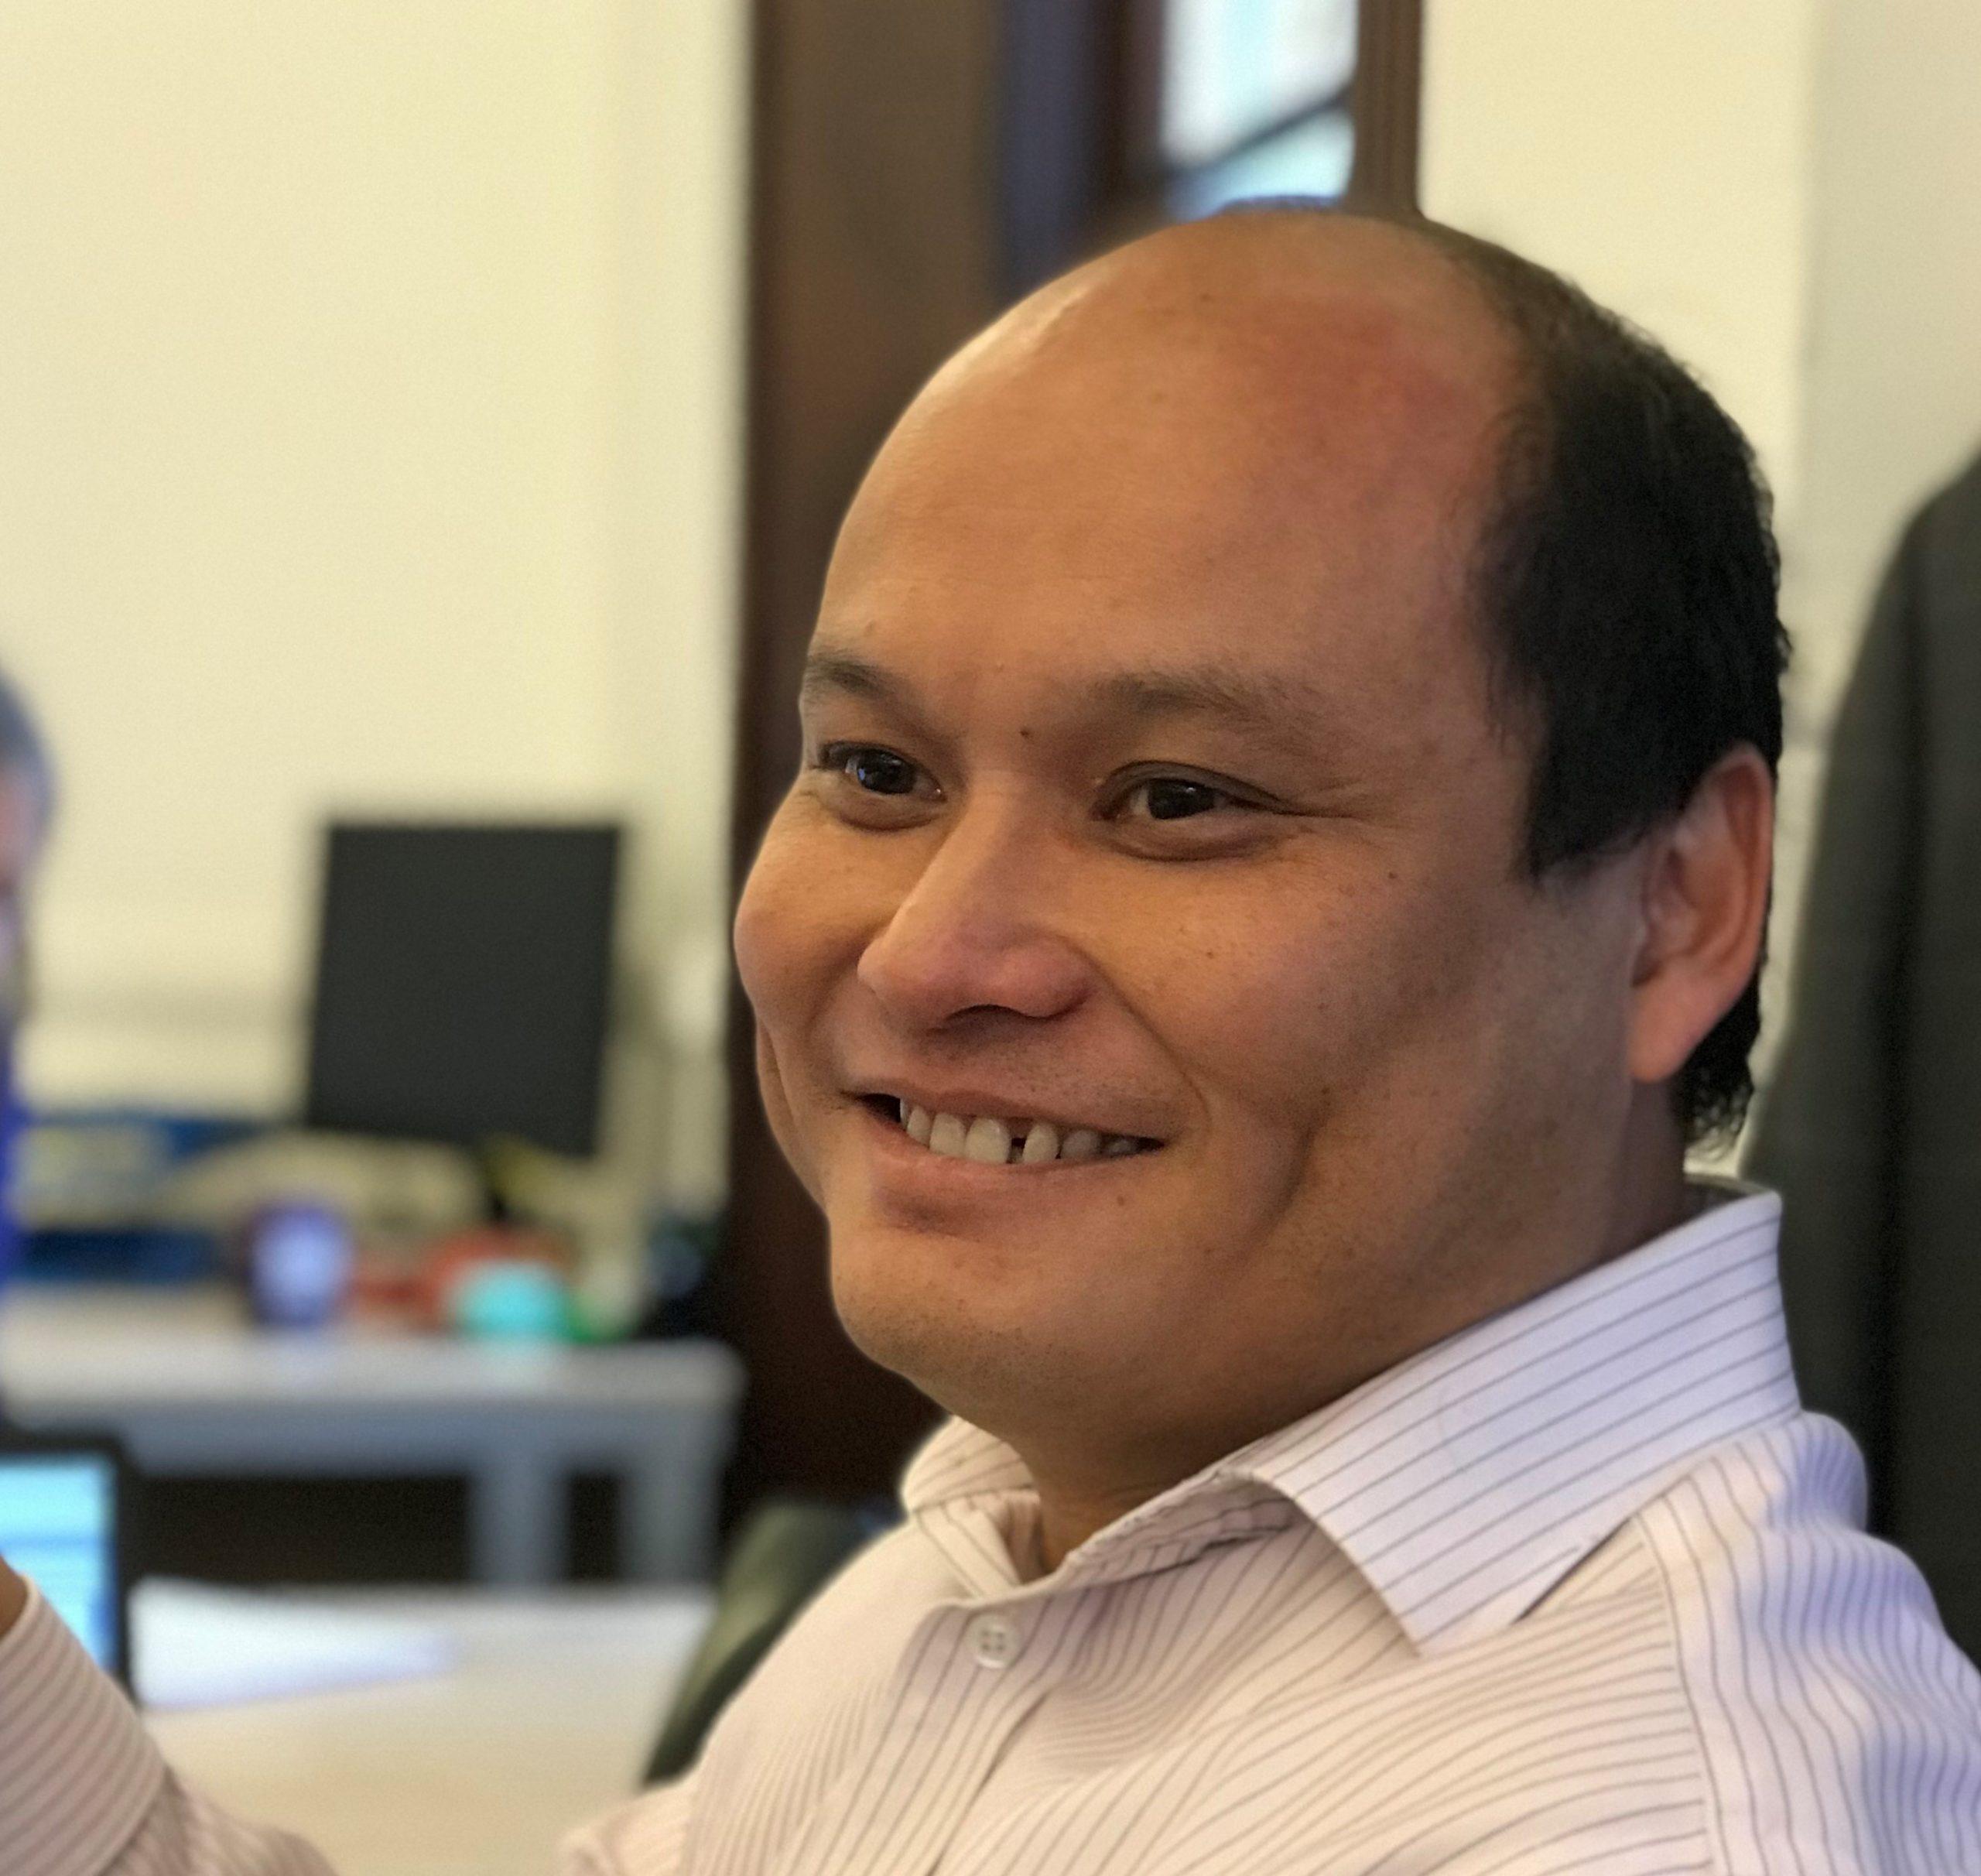 Clarkebond director joins exclusive club of engineers.